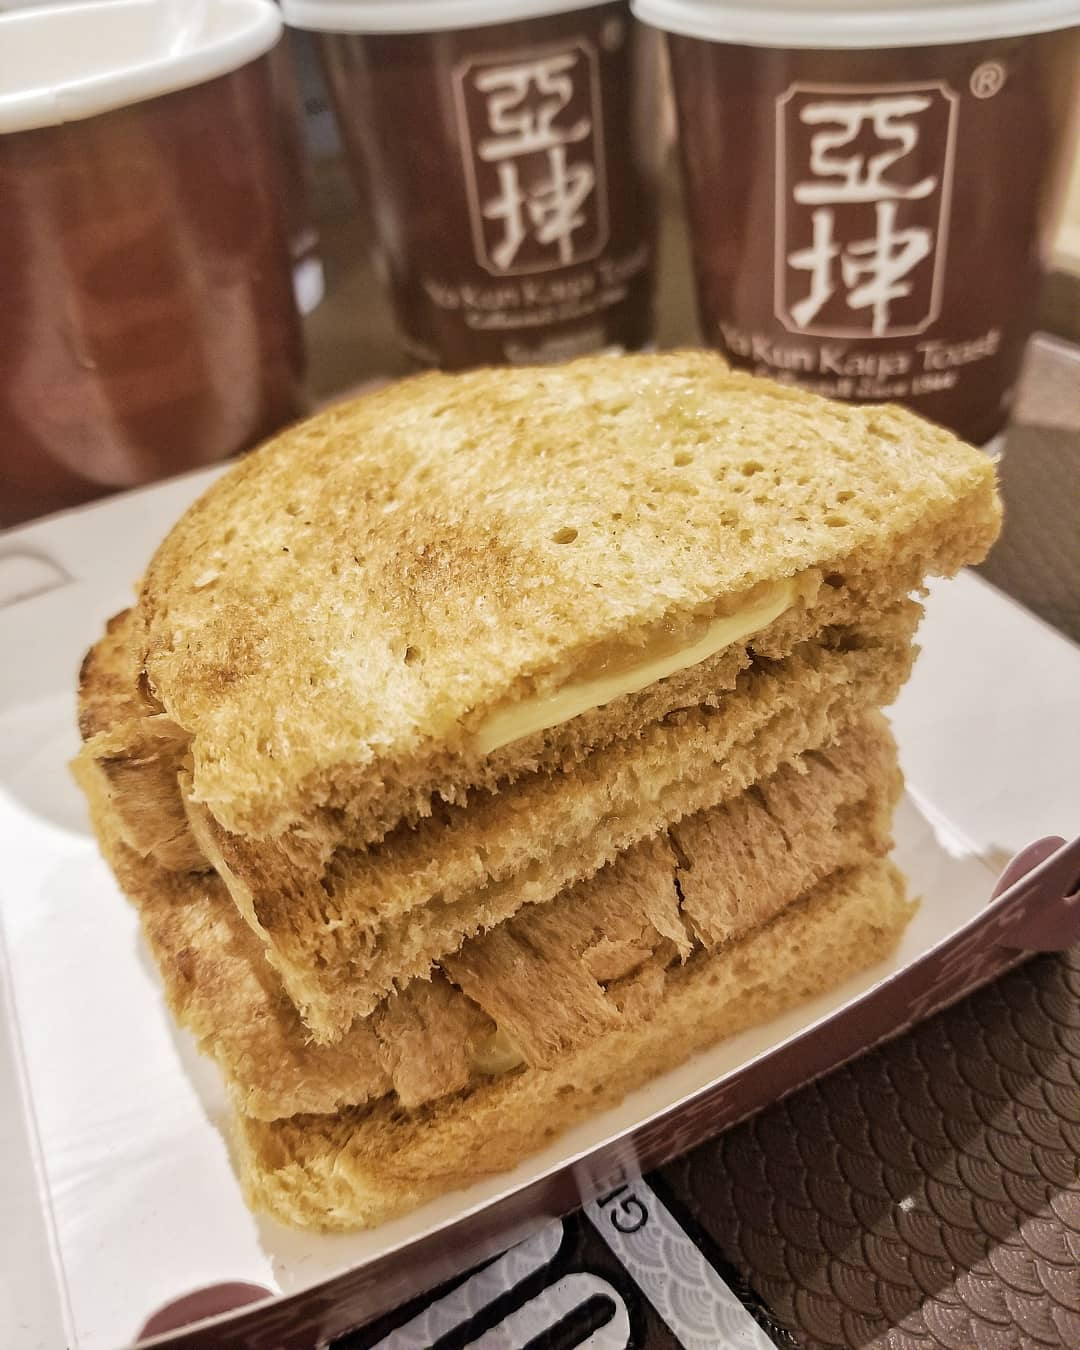 Singapore travel - Kaya Toast